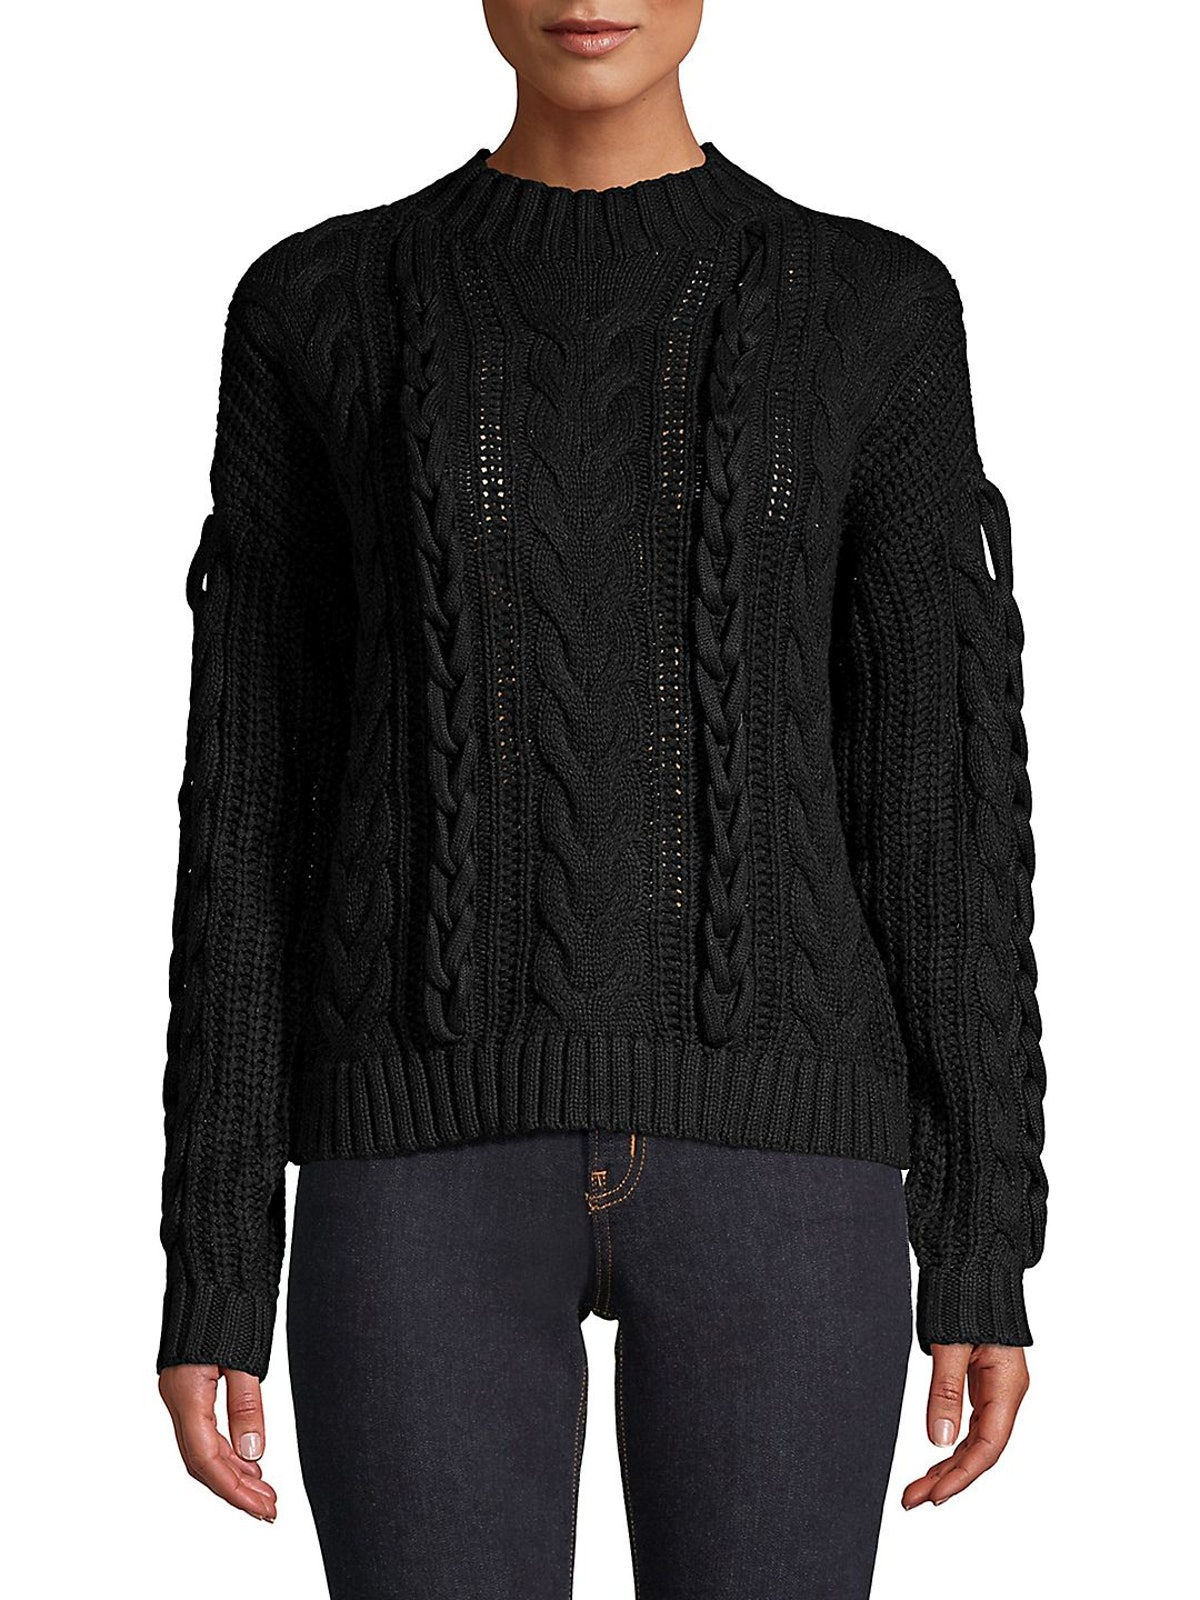 Vero Moda  Cable-Knit Mockneck Sweater